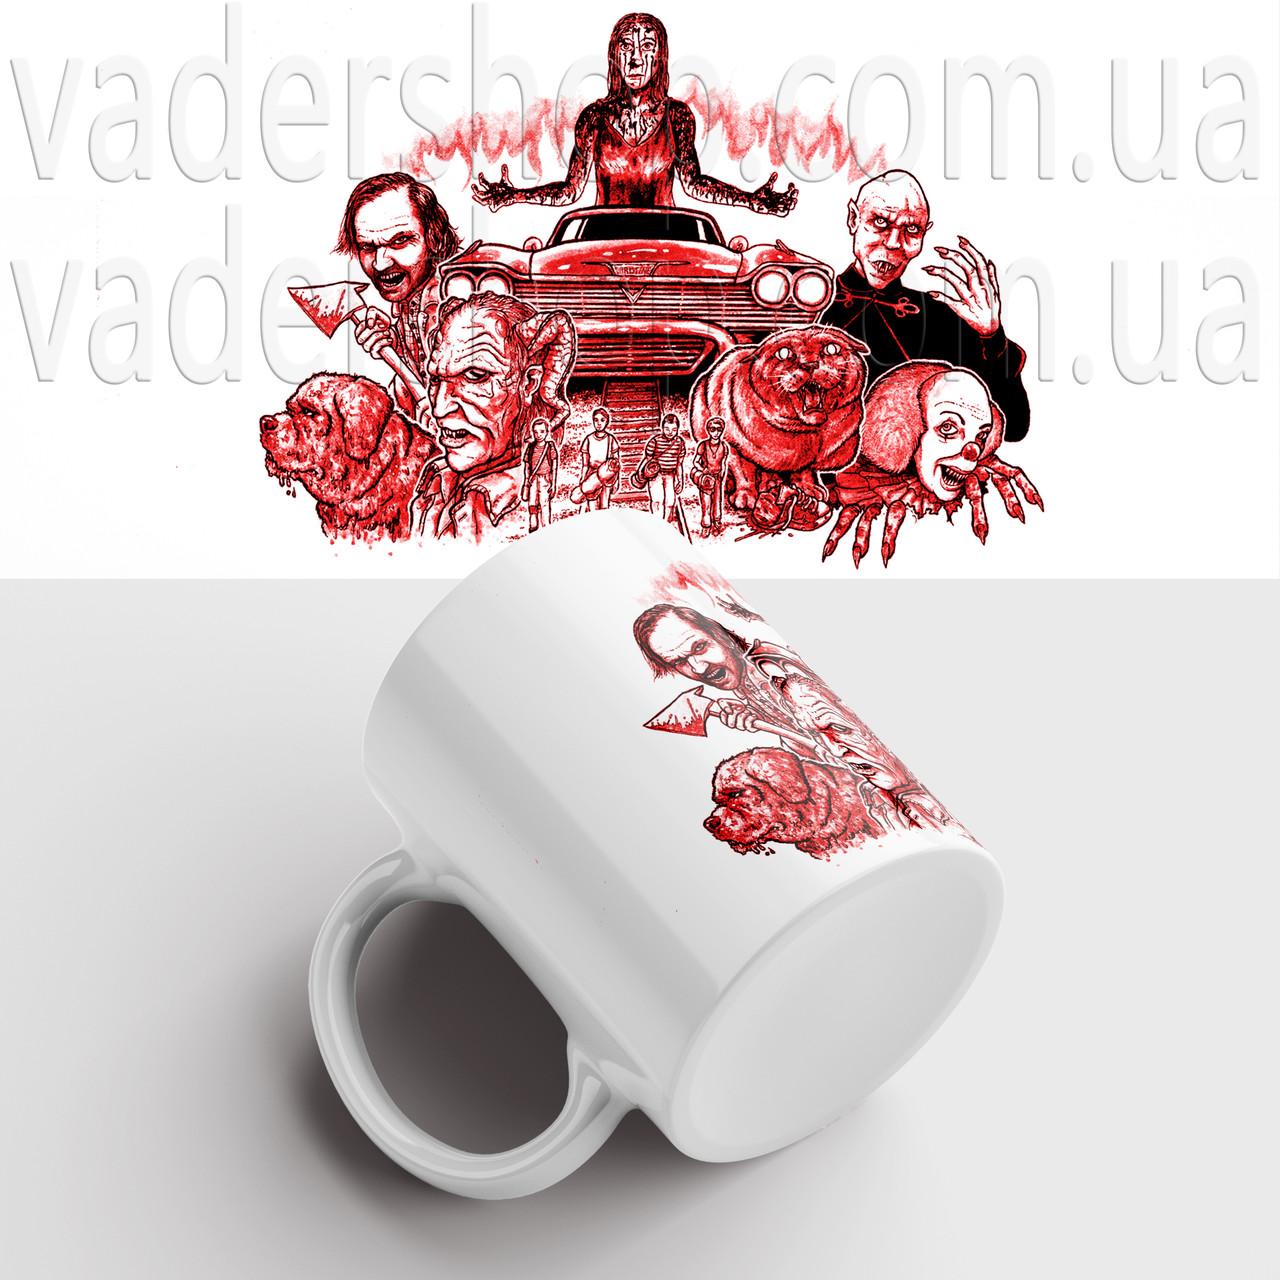 Чашка Стивен Кинг Персонажи. Stephen King. Чашка с фото